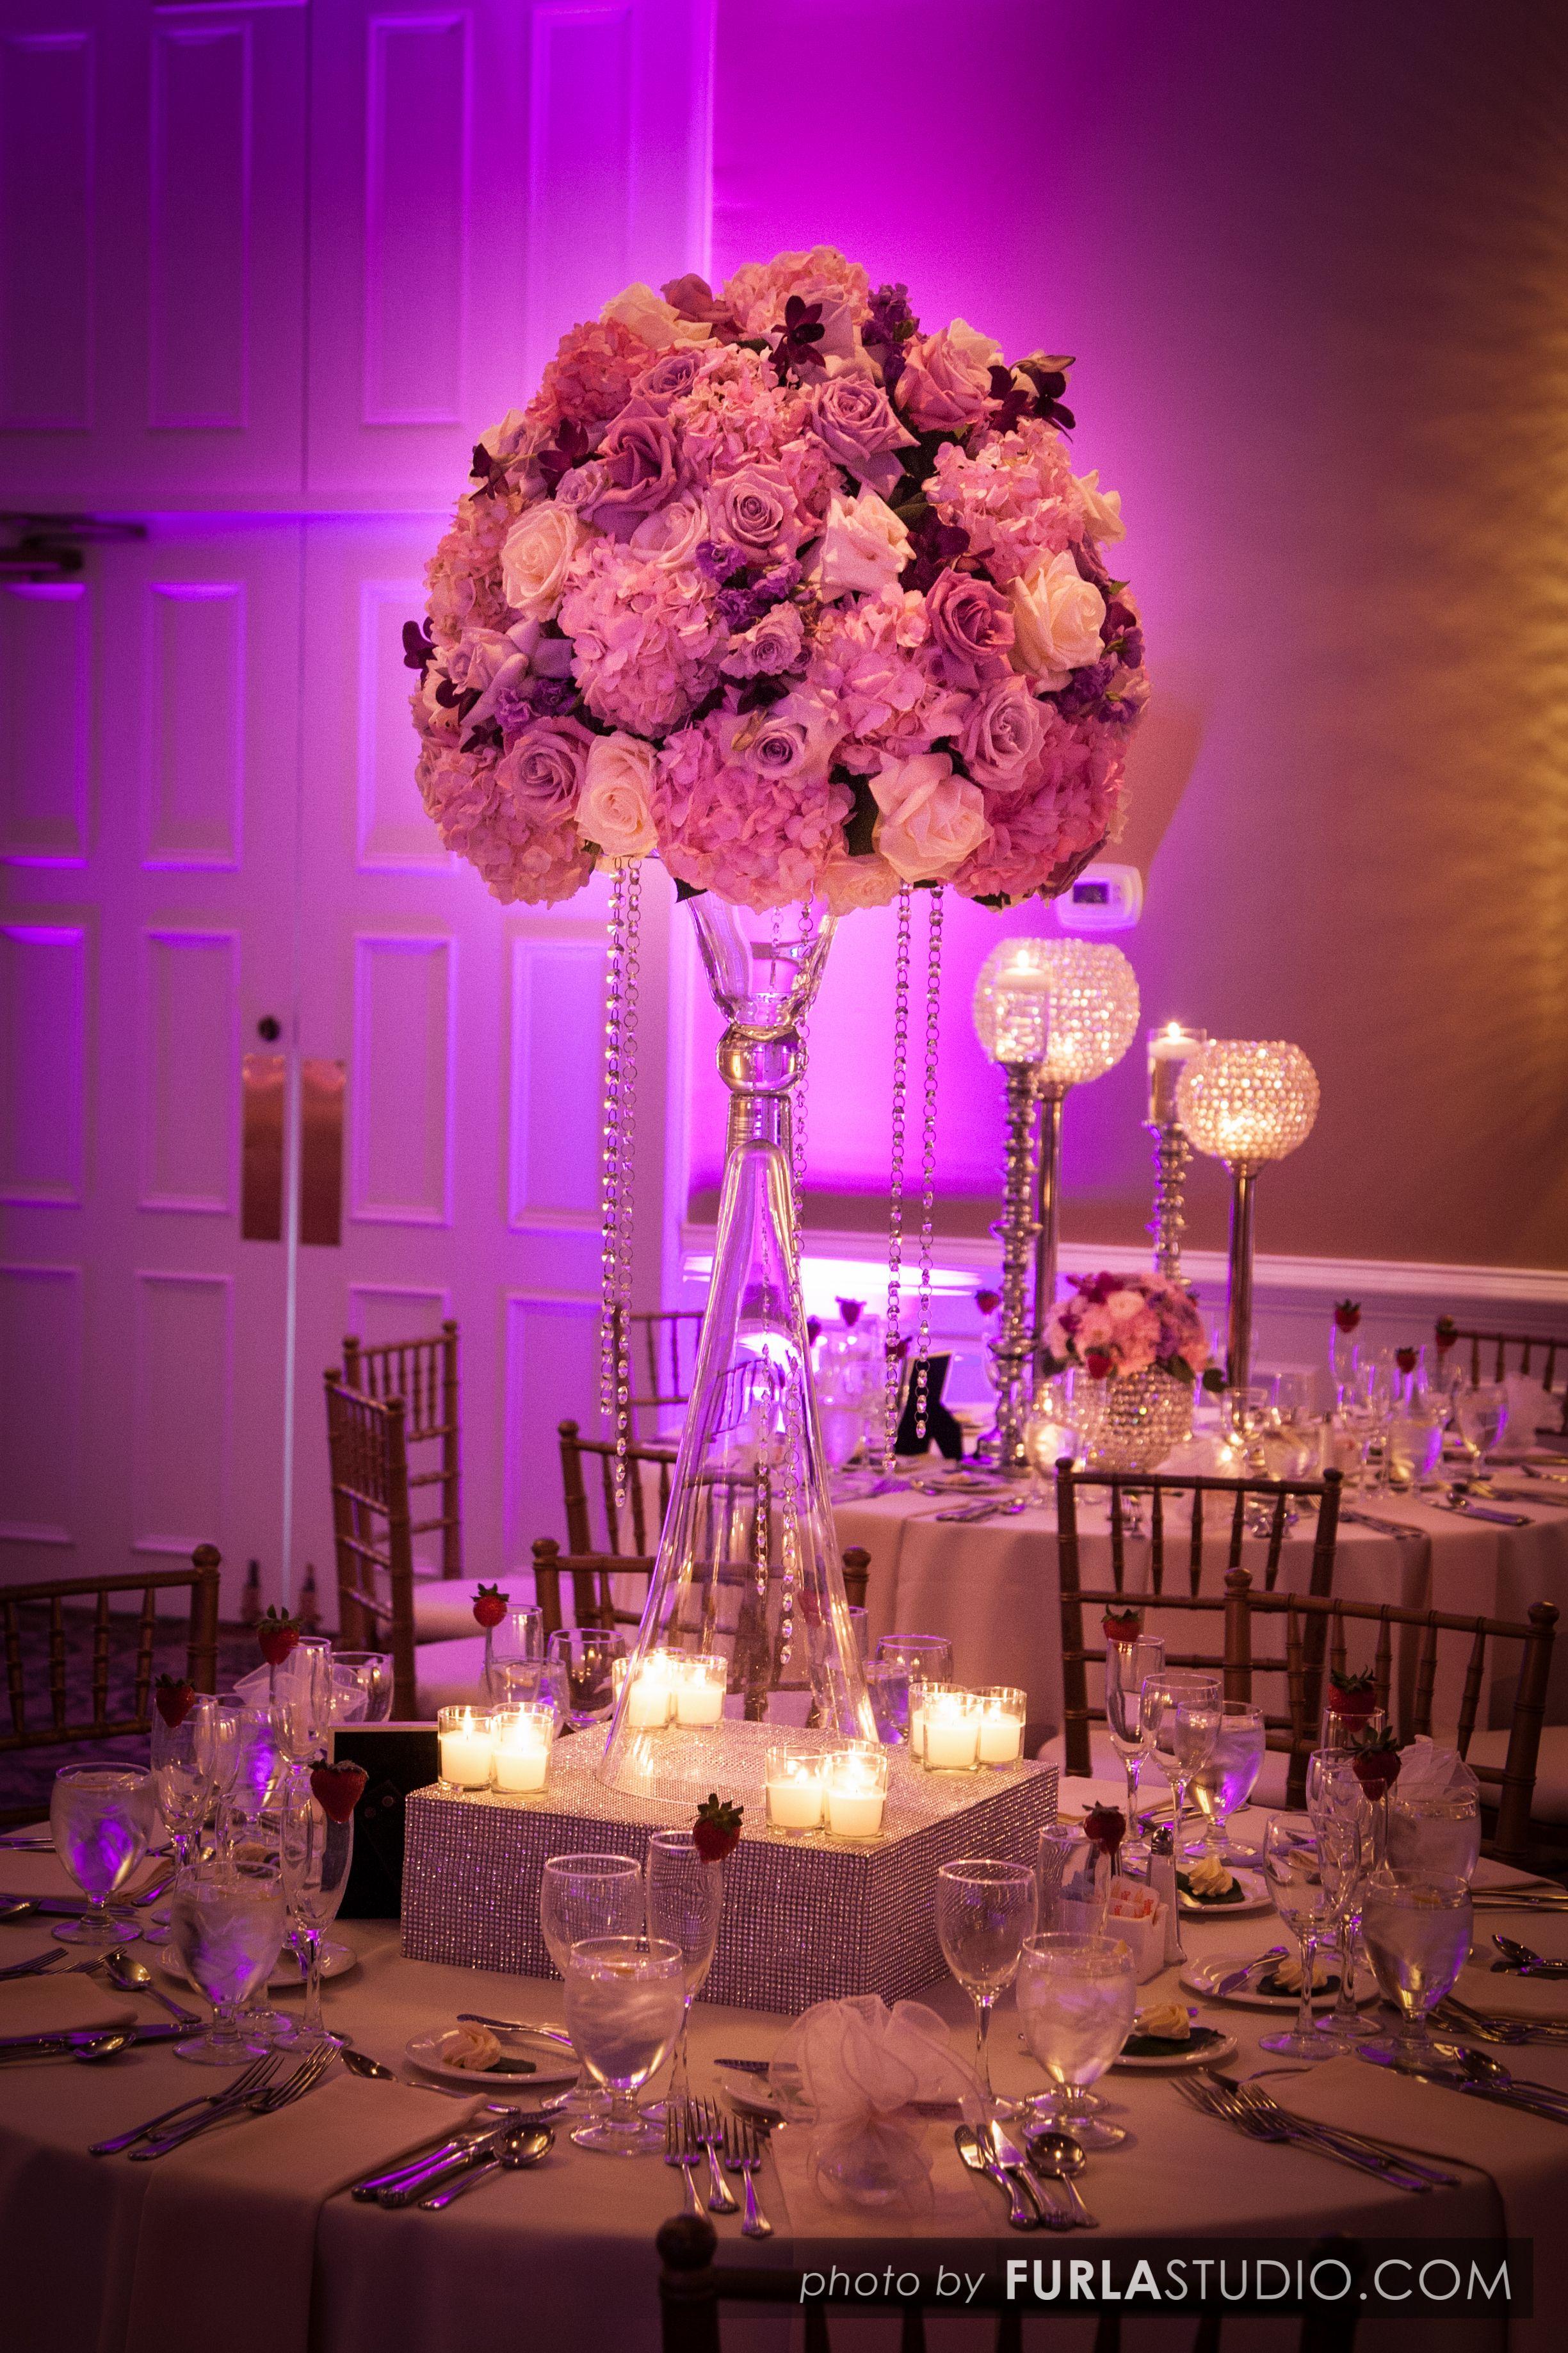 Wedding Flowers and Decorations | Diamante de cristal, Centro de ...